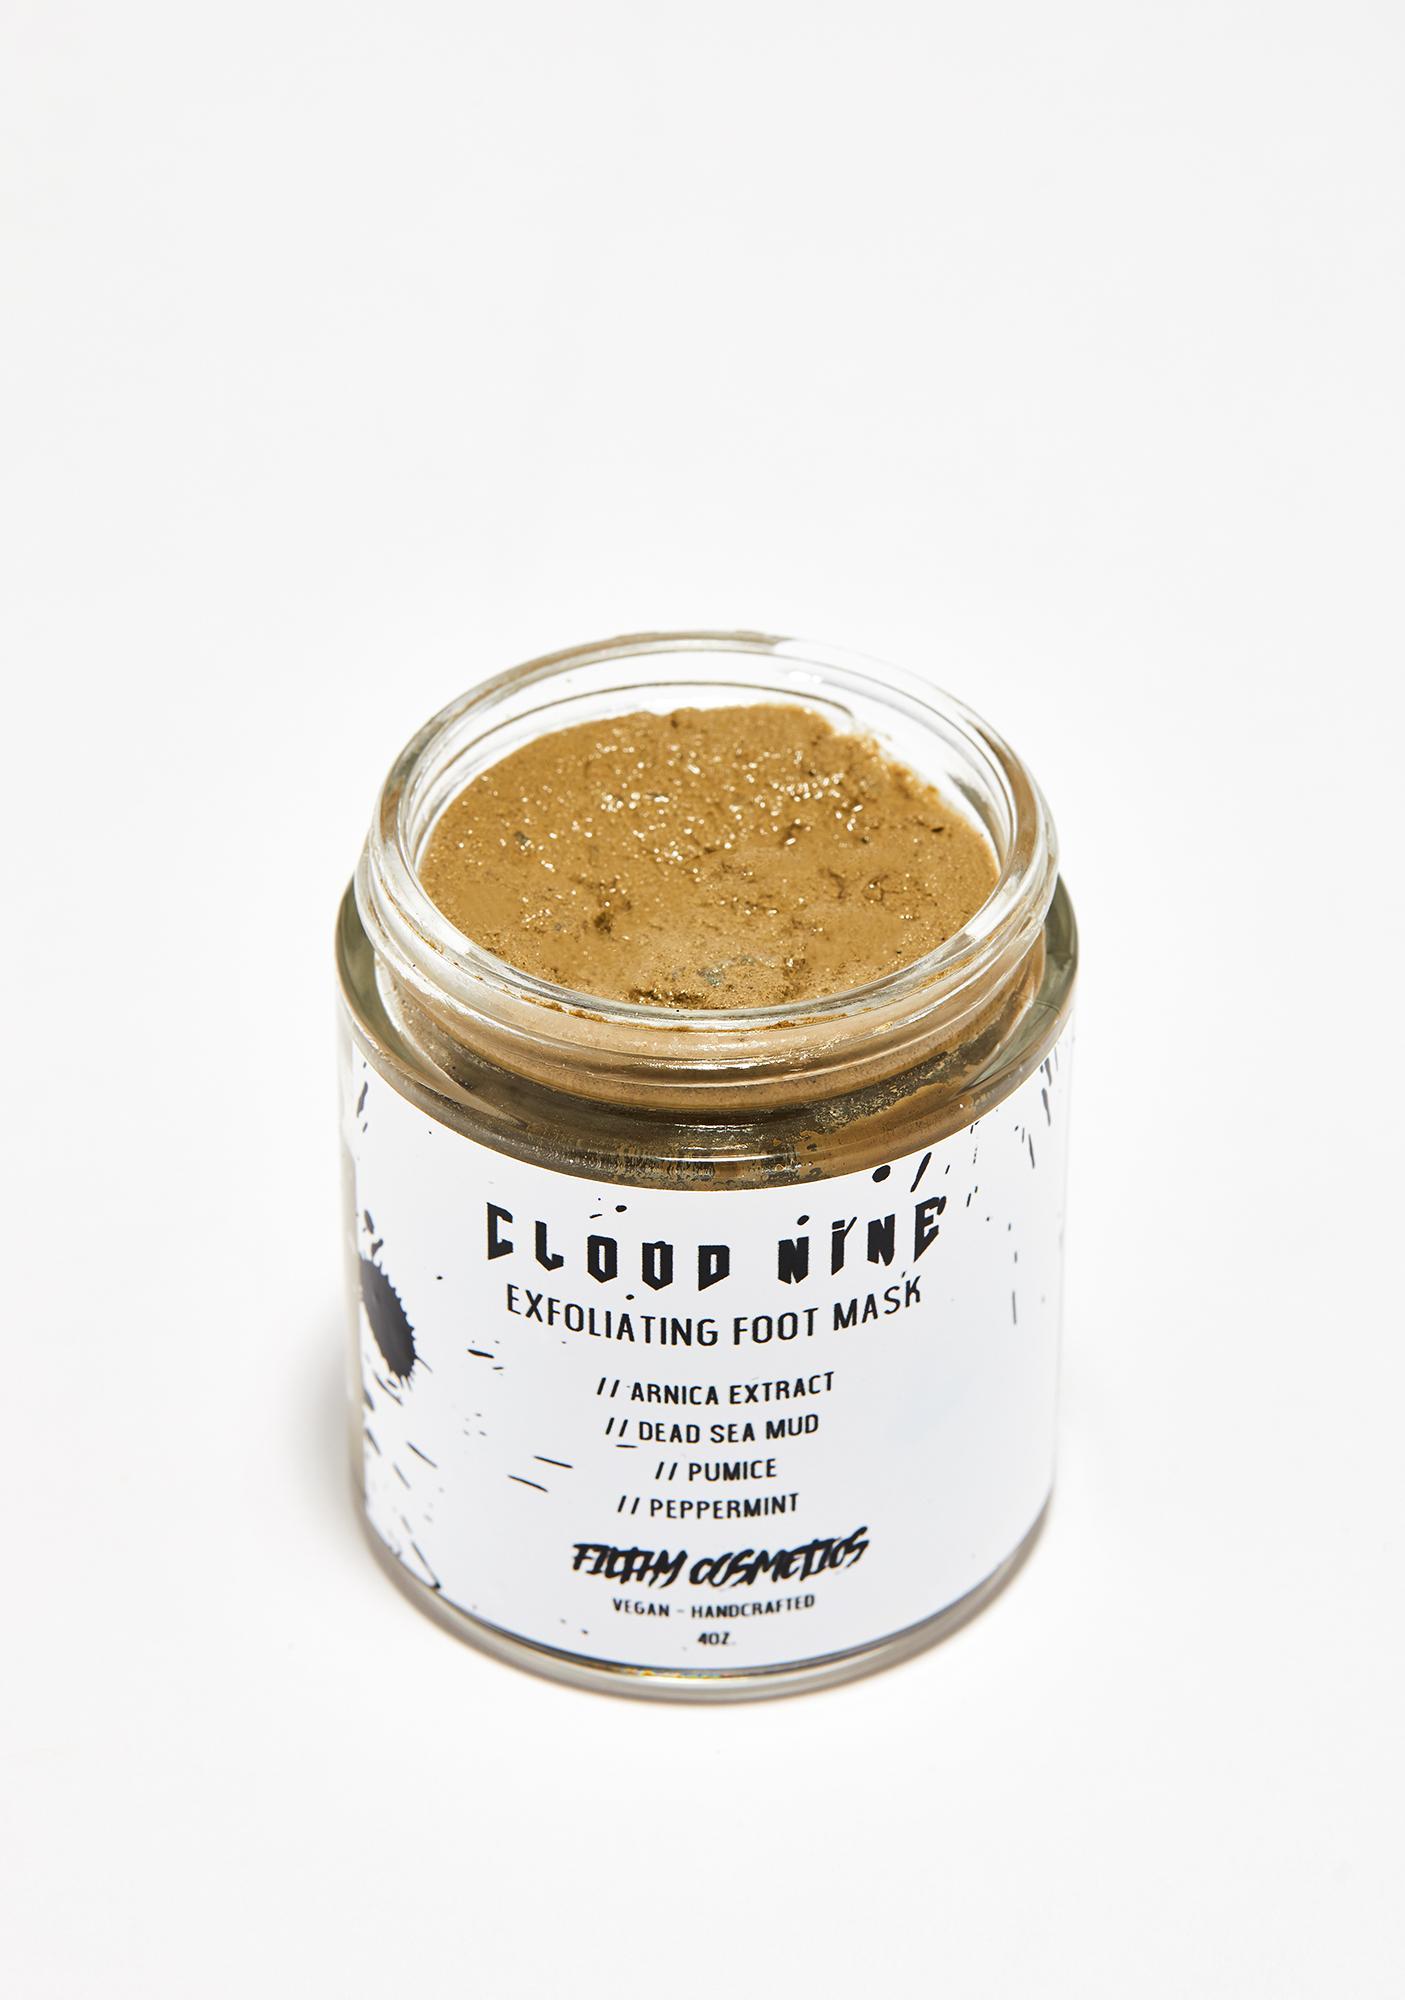 Filthy Cosmetics Cloud Nine Exfoliating Foot Mask